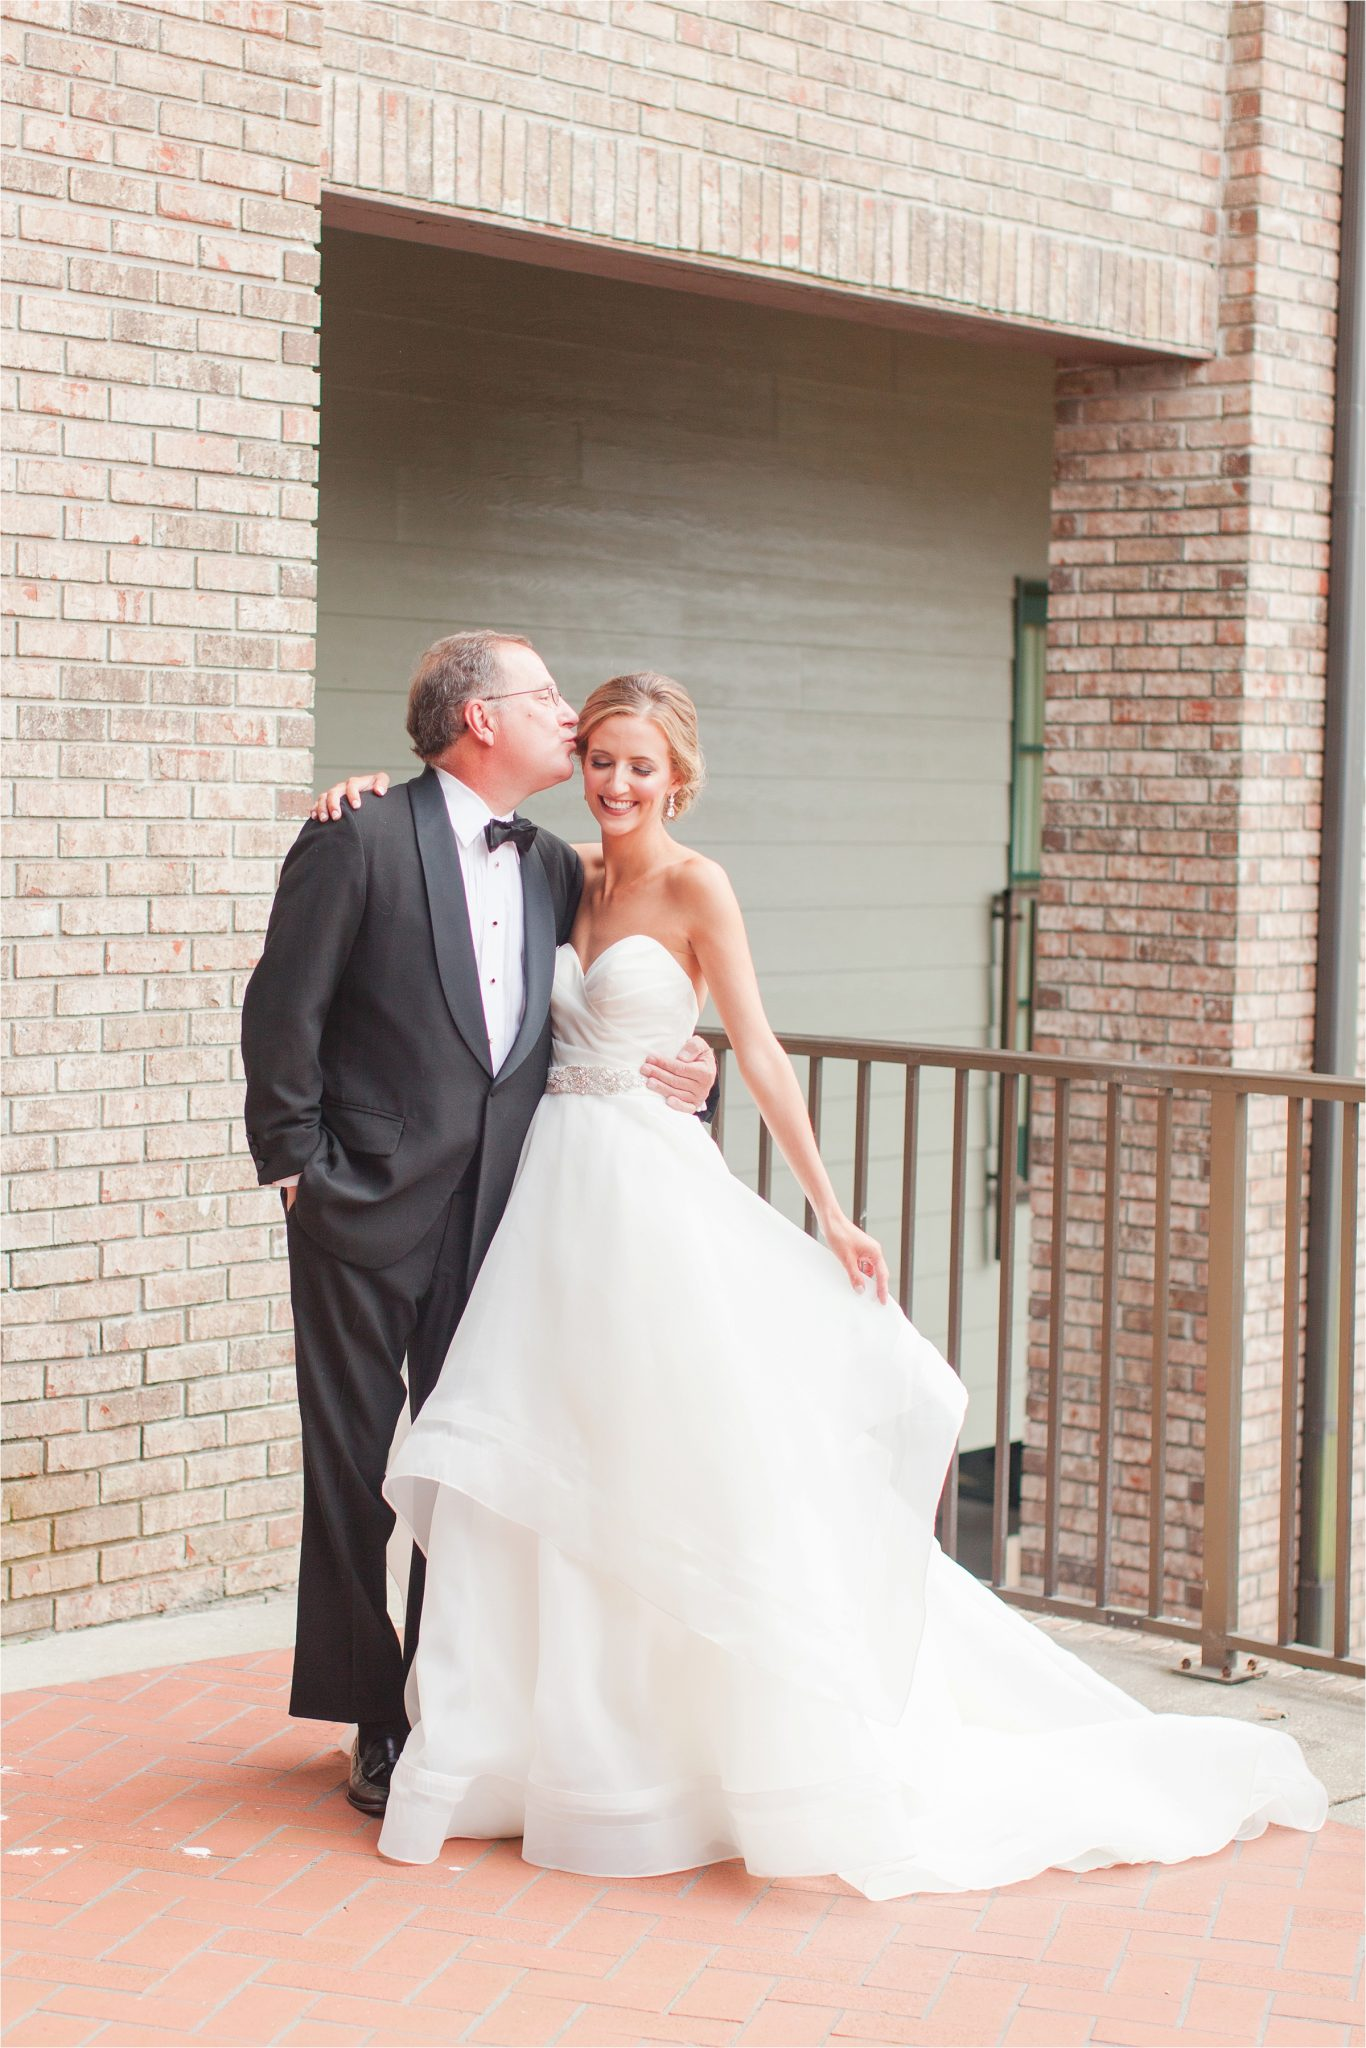 Classy Light Blue Wedding-Point Clear, Alabama Wedding Photographer-Wedding dress-Wedding gown-Bride and father wedding day-Bride and father precious moments